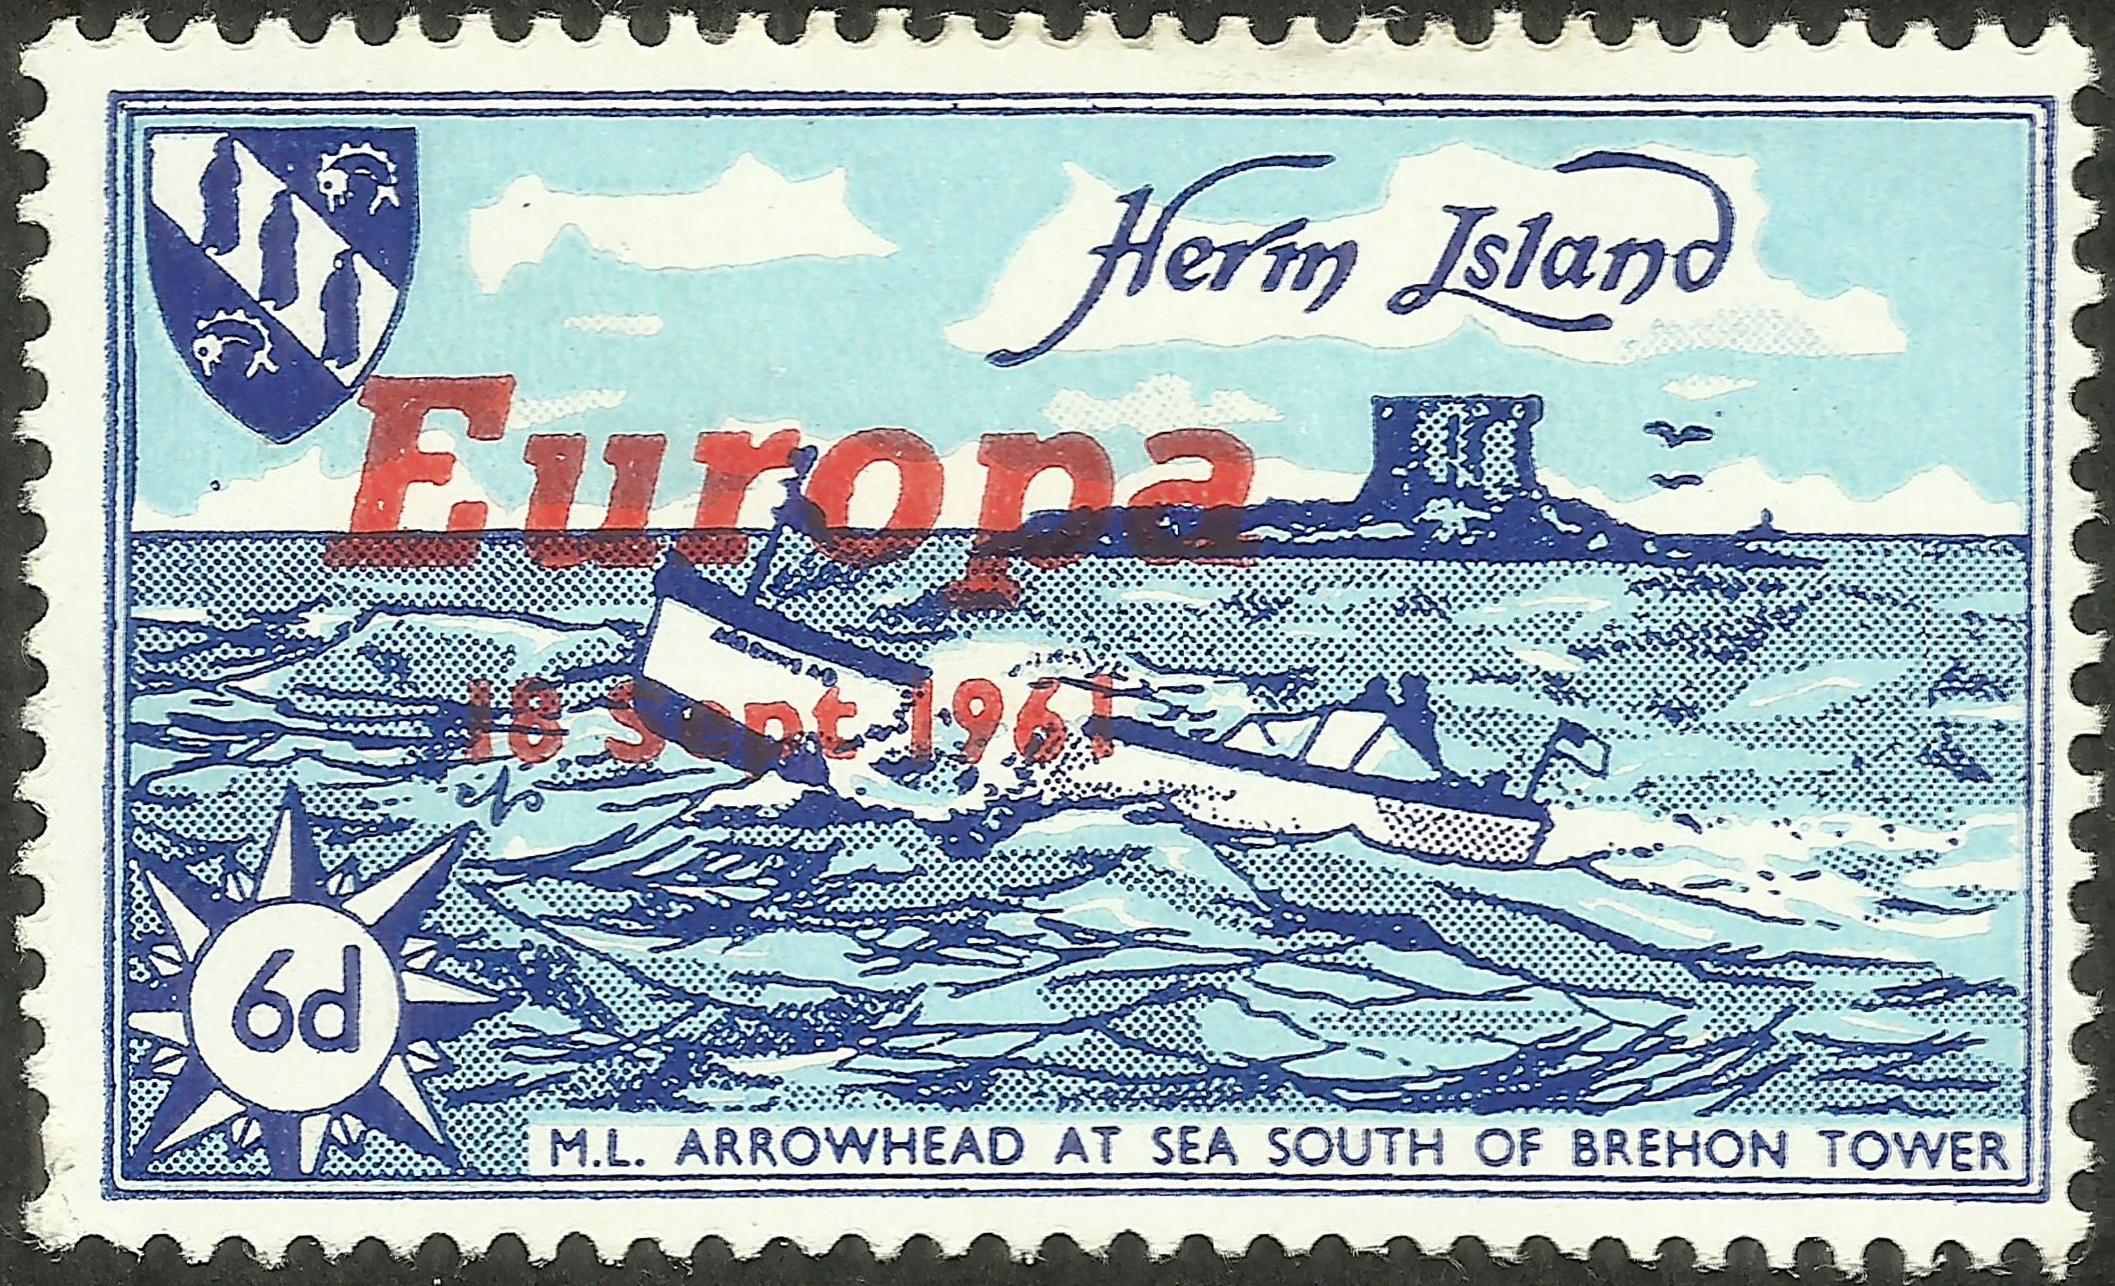 Herm Island B&F #75 (1961)